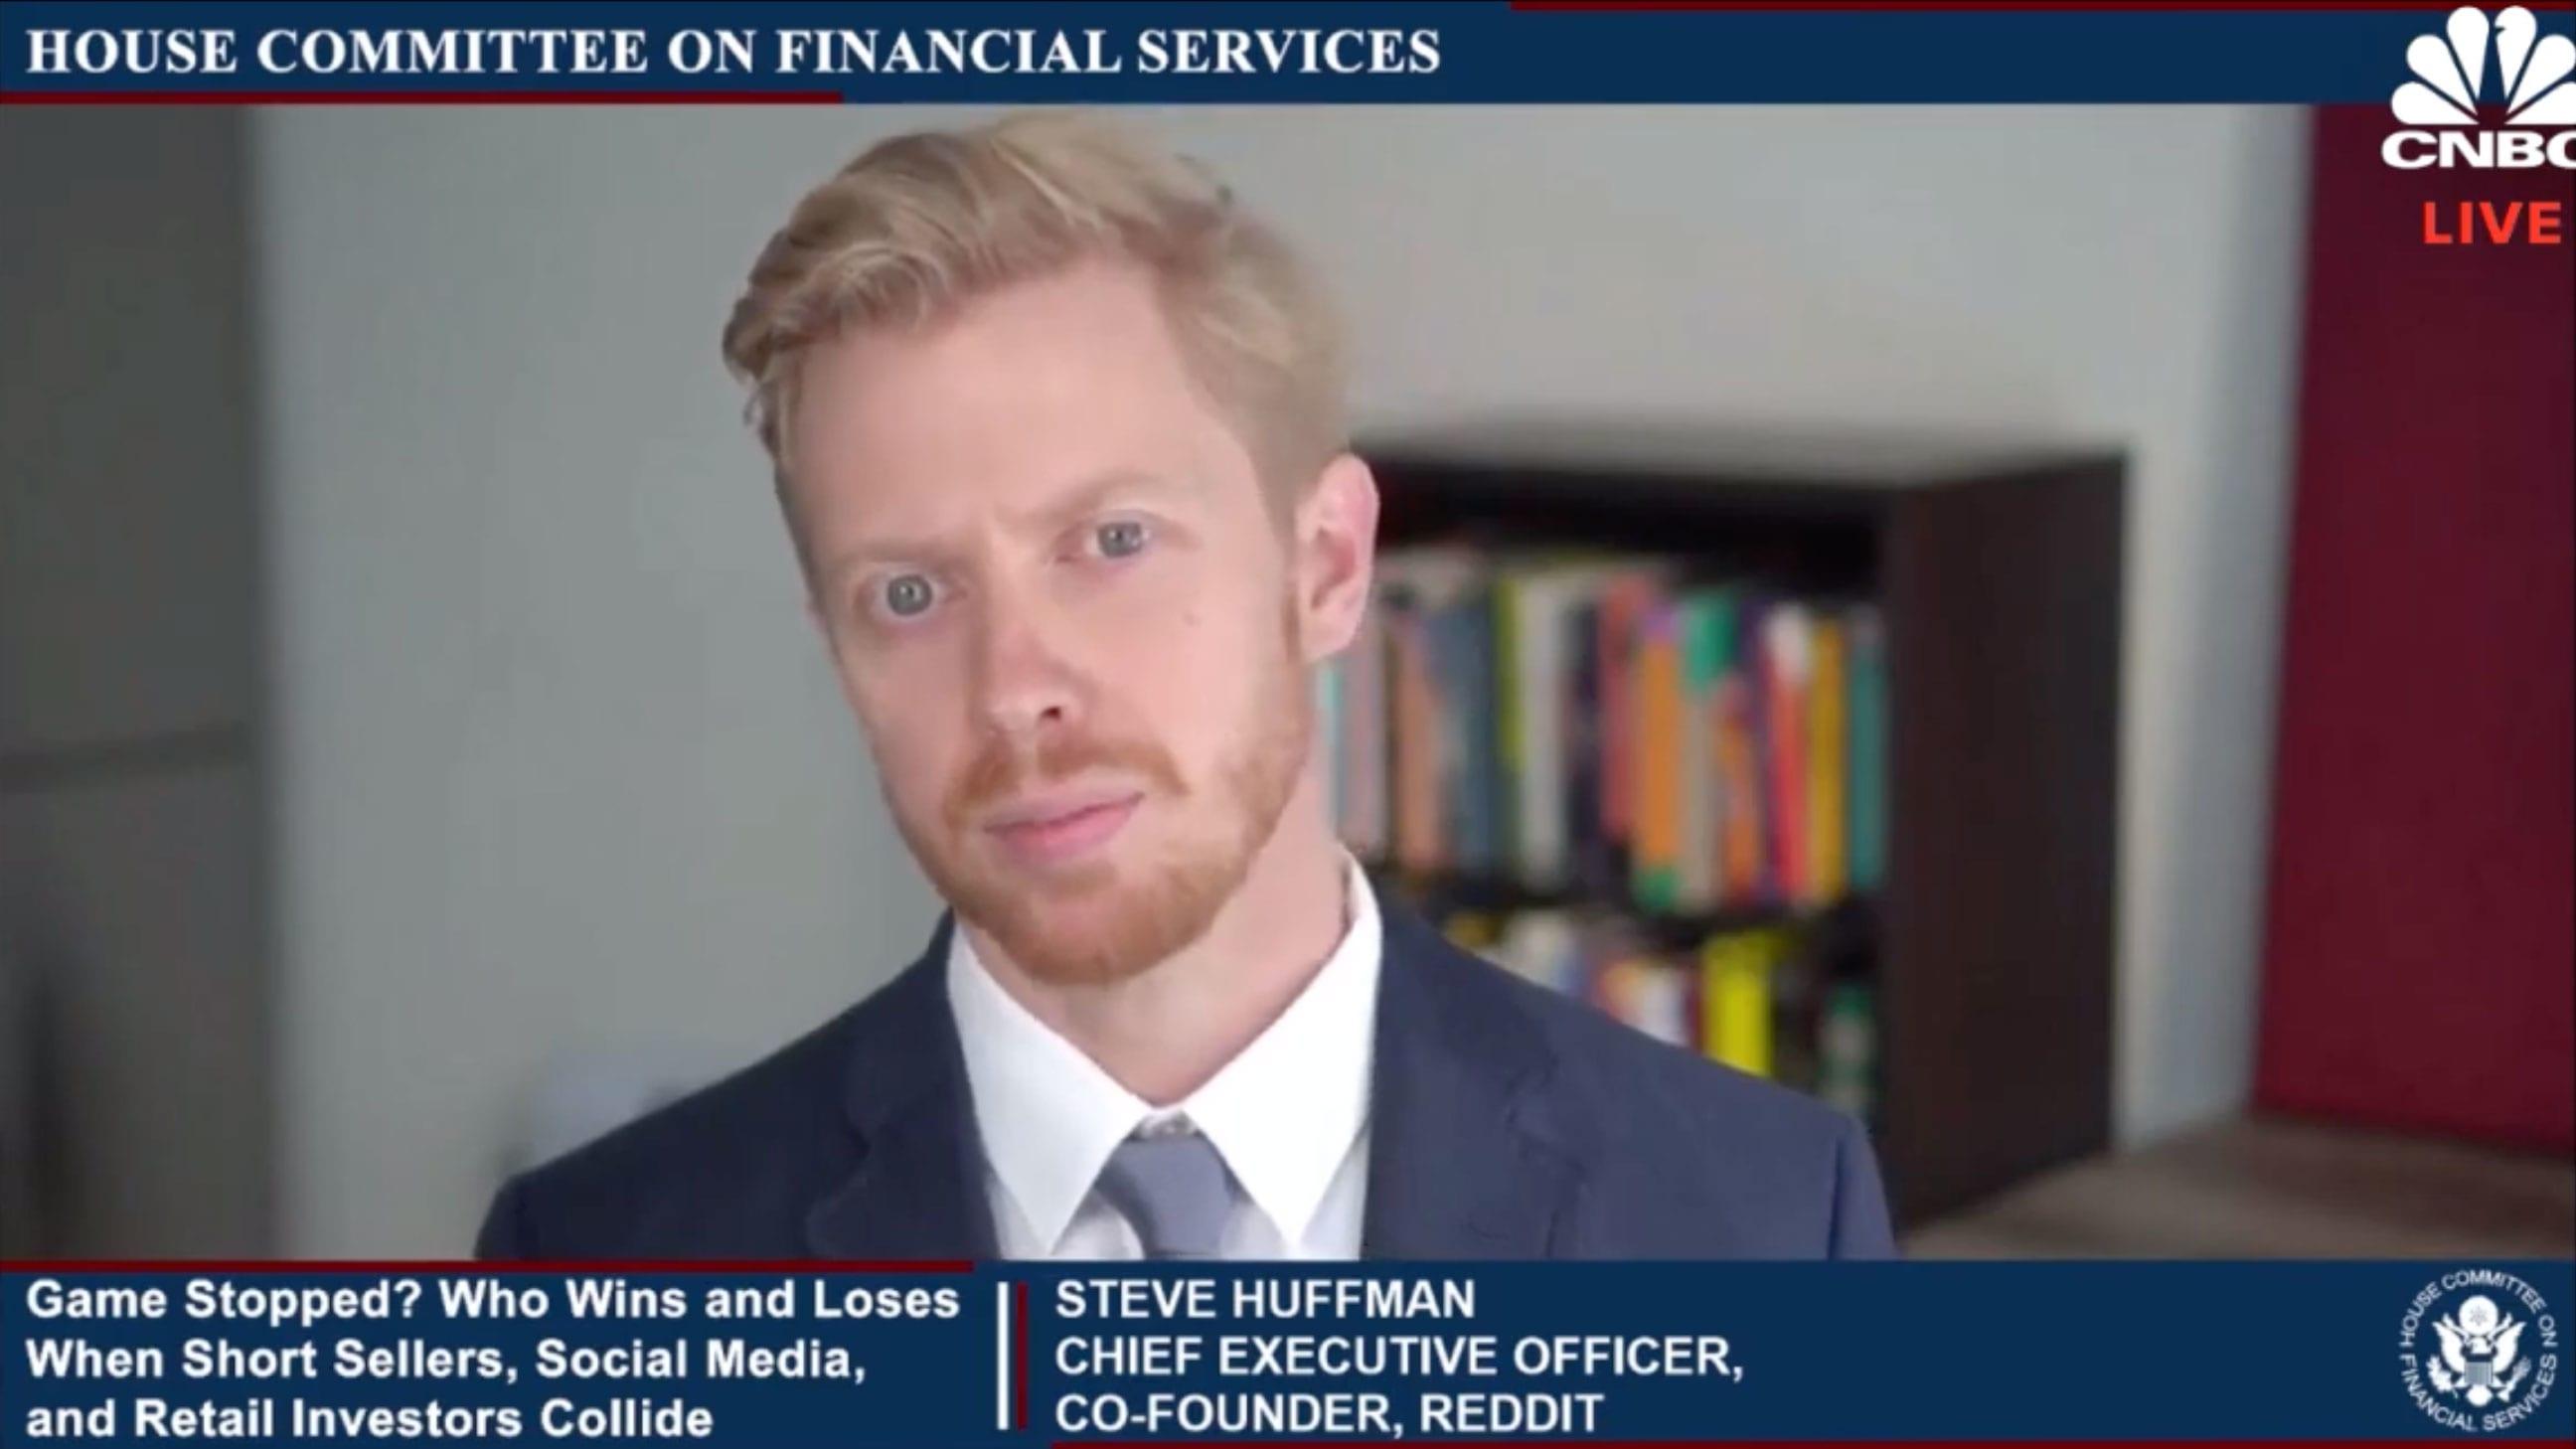 Reddit CEO defends platform's role in GameStop surge - CNBC